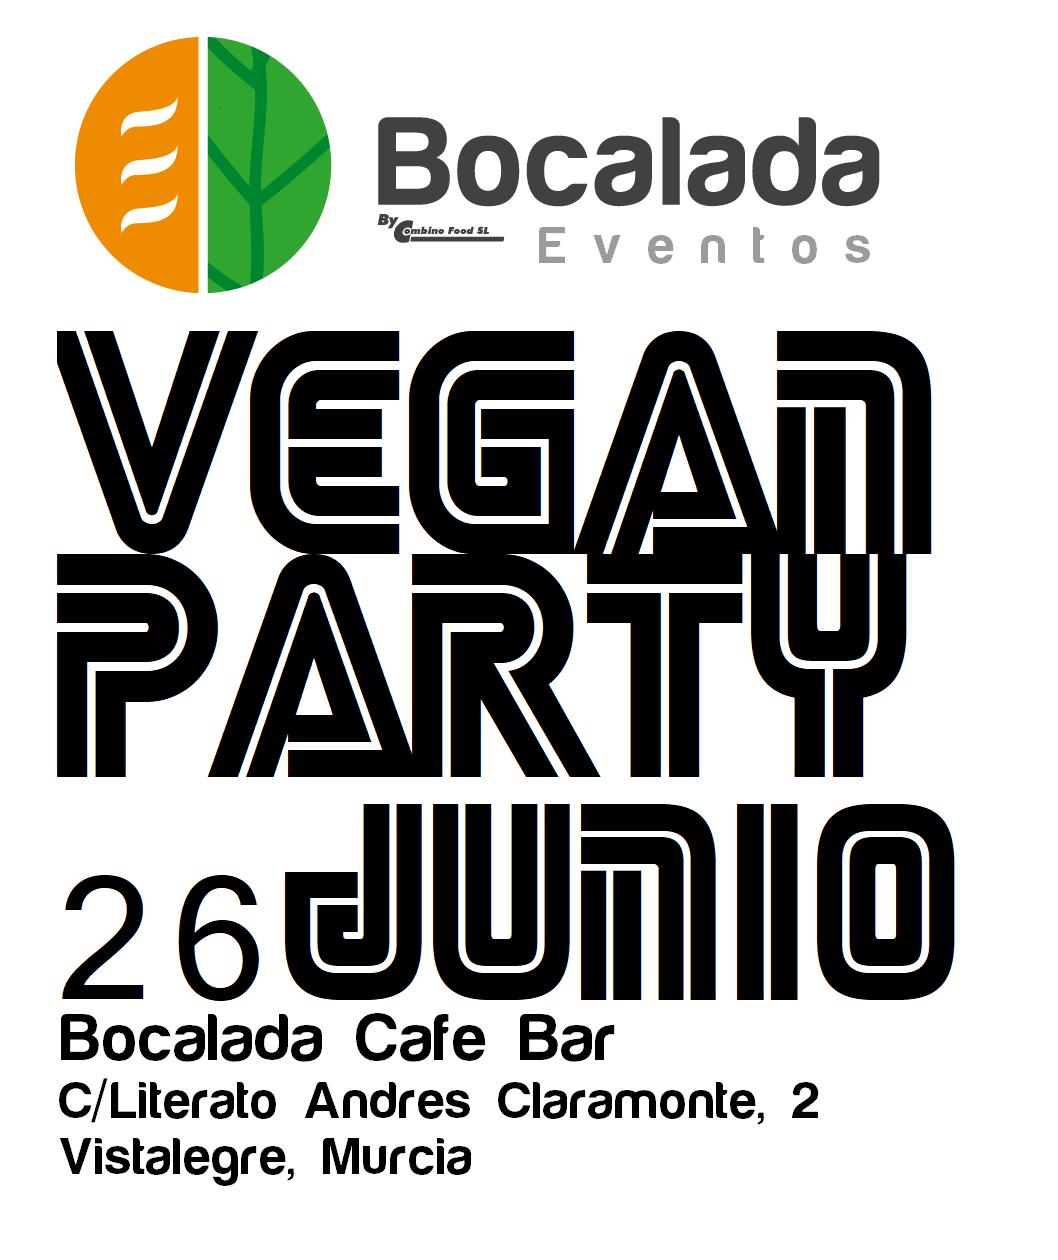 vegan party.png